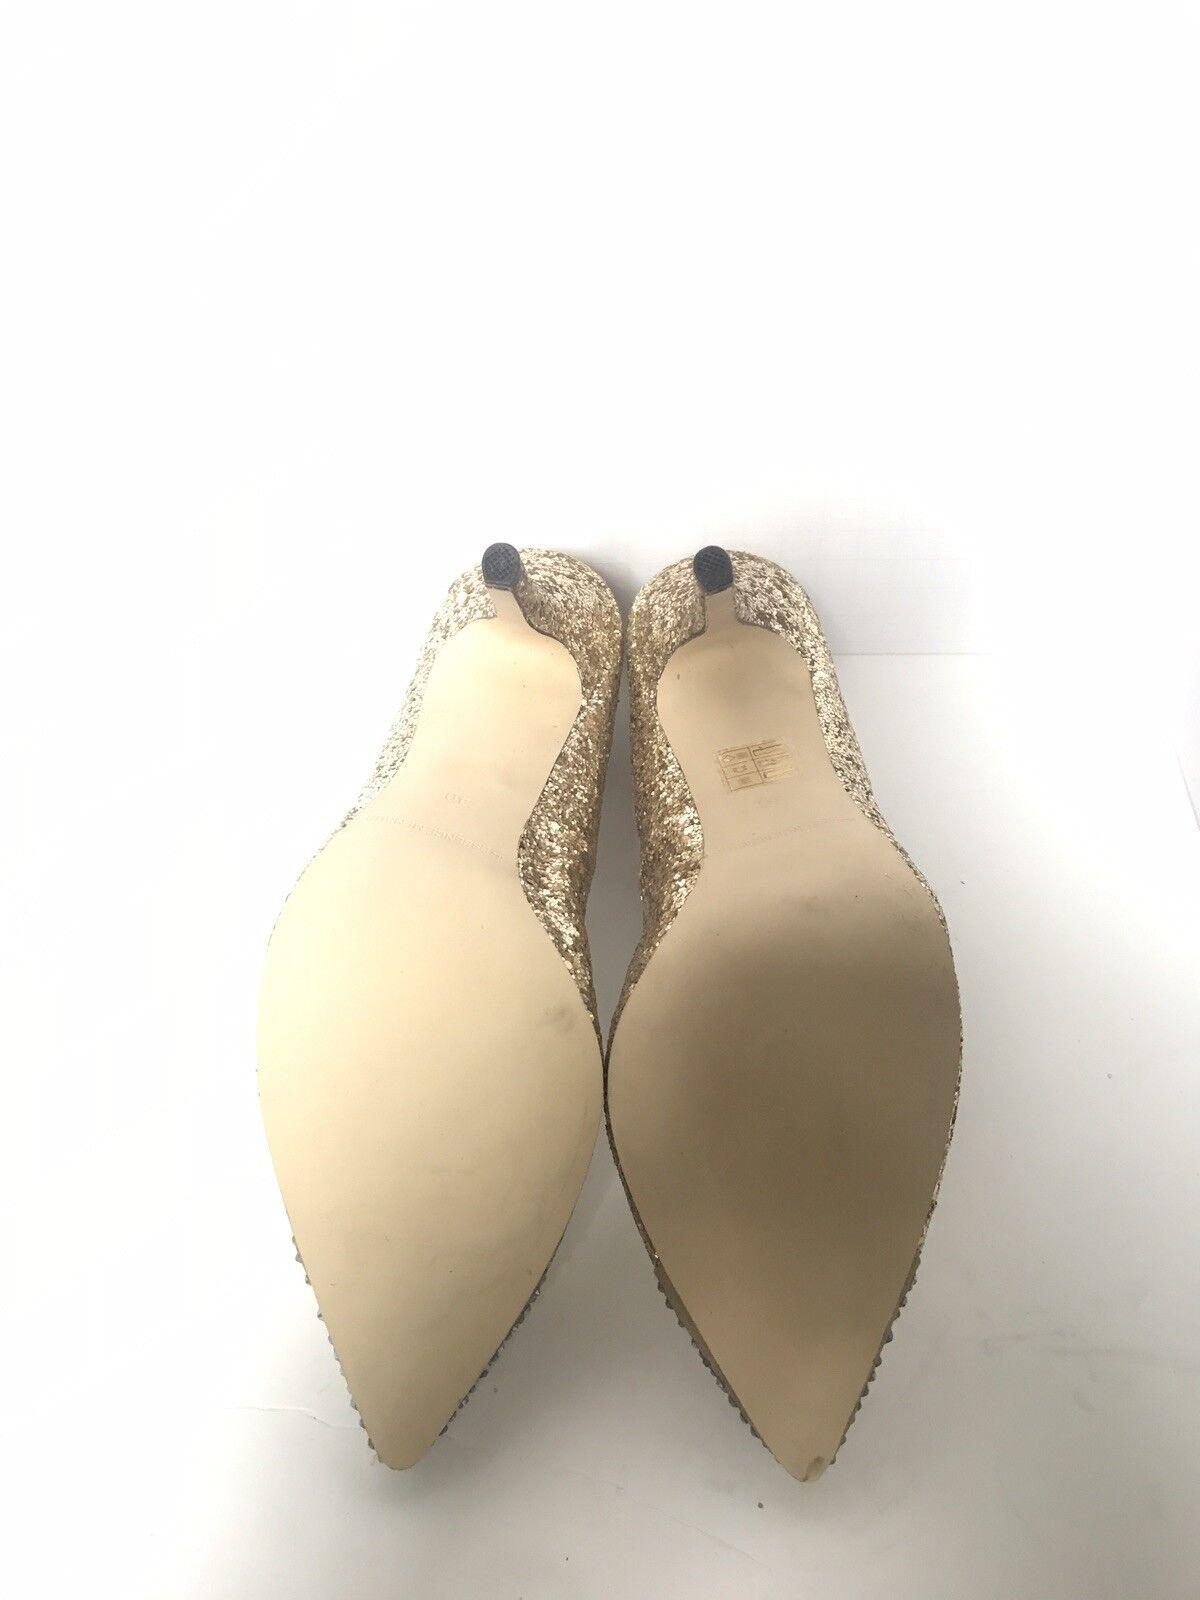 ESSENCEMENBUR Gold Sparkling textile cap toe heels sz. 40 40 40 265c5f